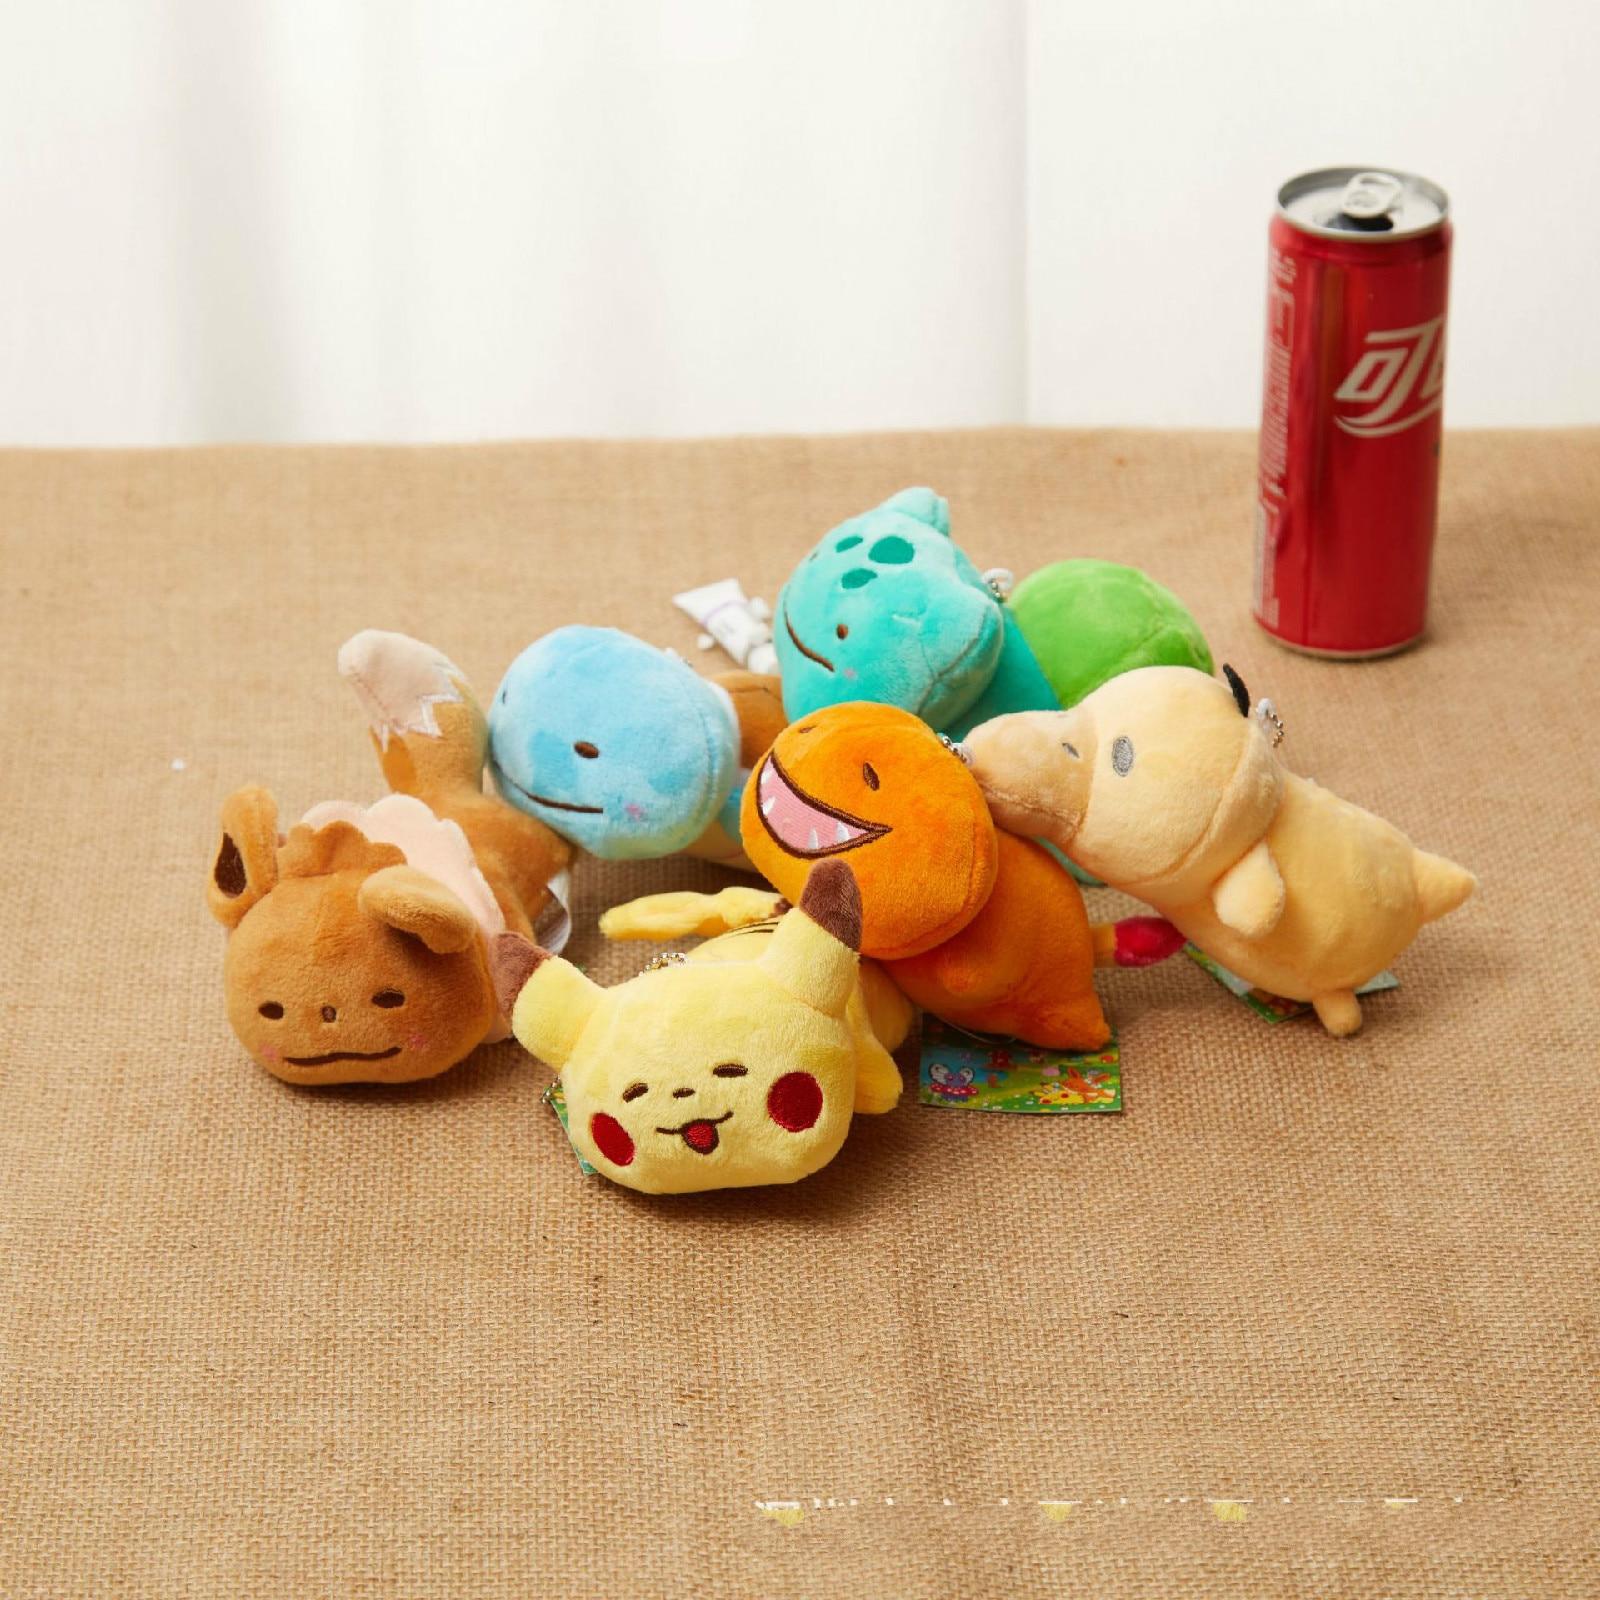 12cm Pocket Monster Pokemon Keychain Pendant Pikachu Charmander Squirtle Bulbasaur Stuffed Plush Dolls Toy Gift Kid Children